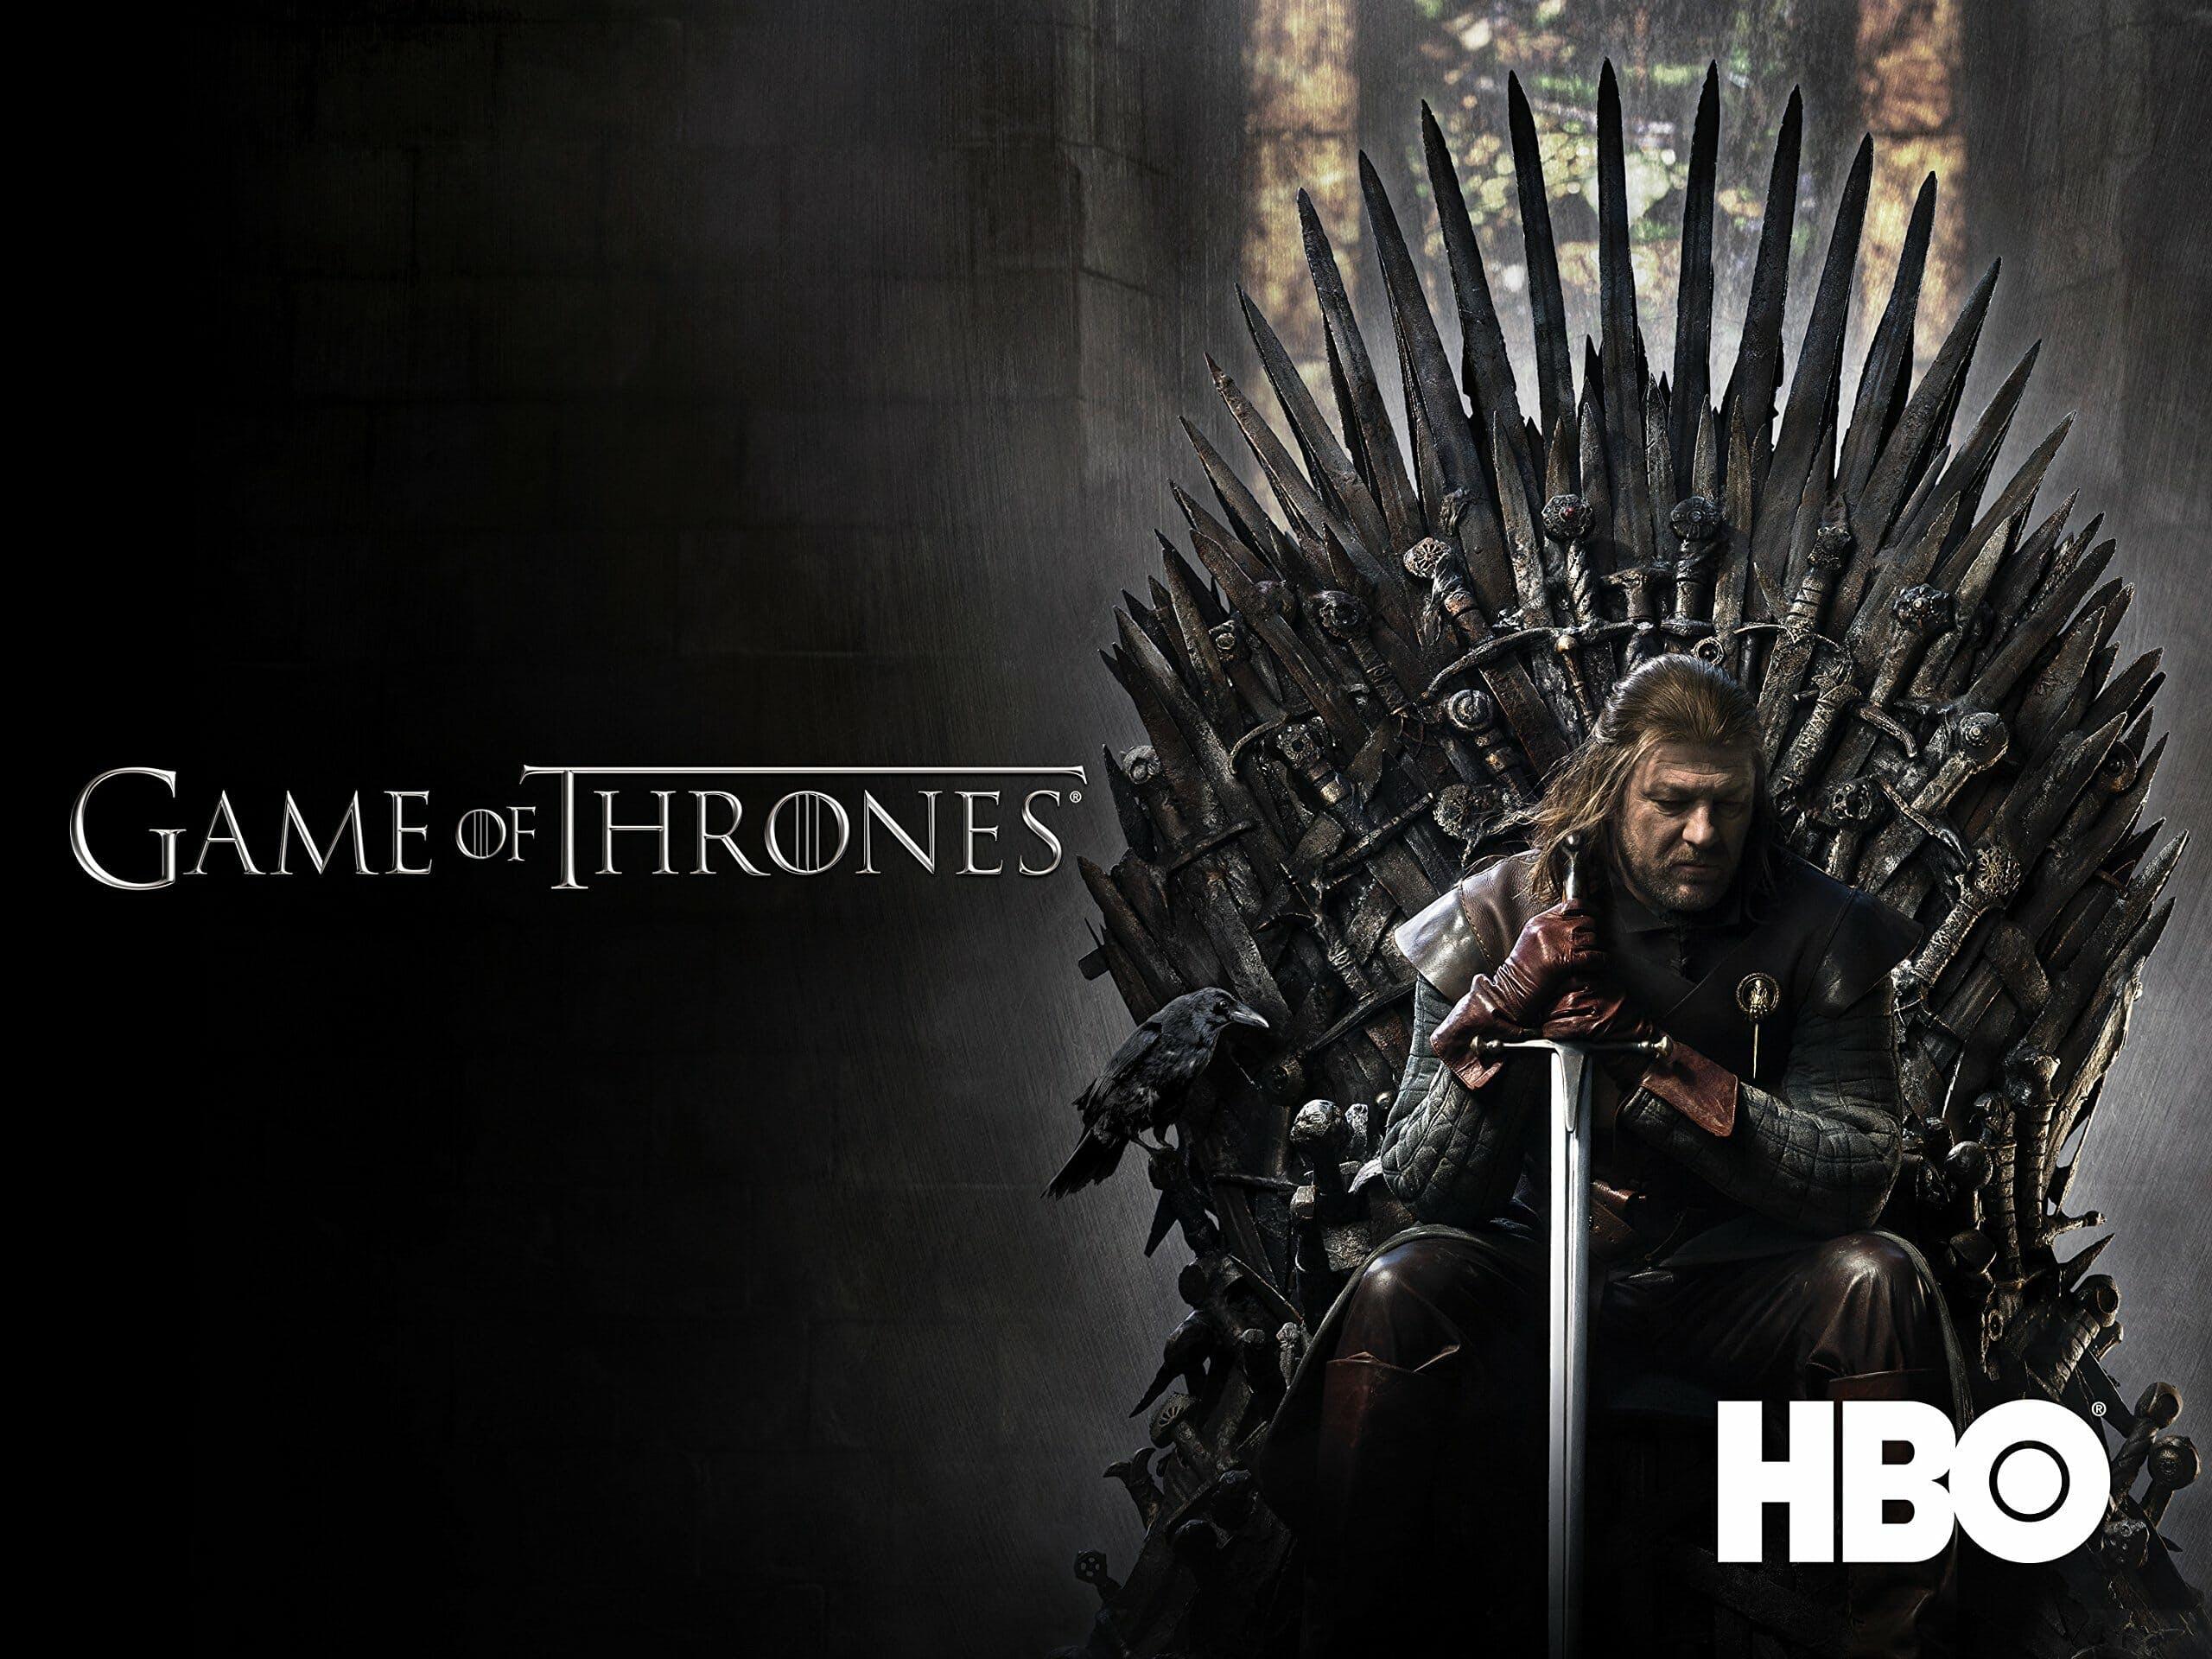 watch game of thrones season 8 episode 4 online free on Amazon